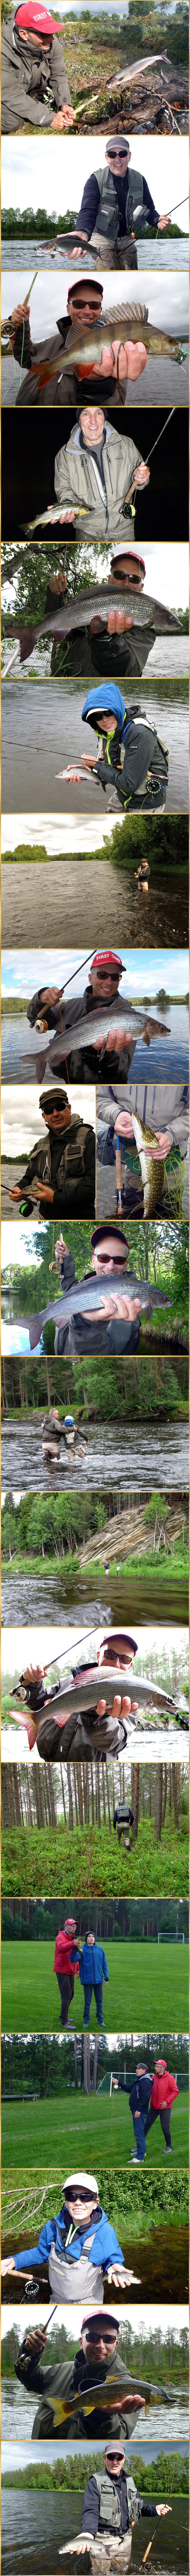 fly fishing school bernd ziesche